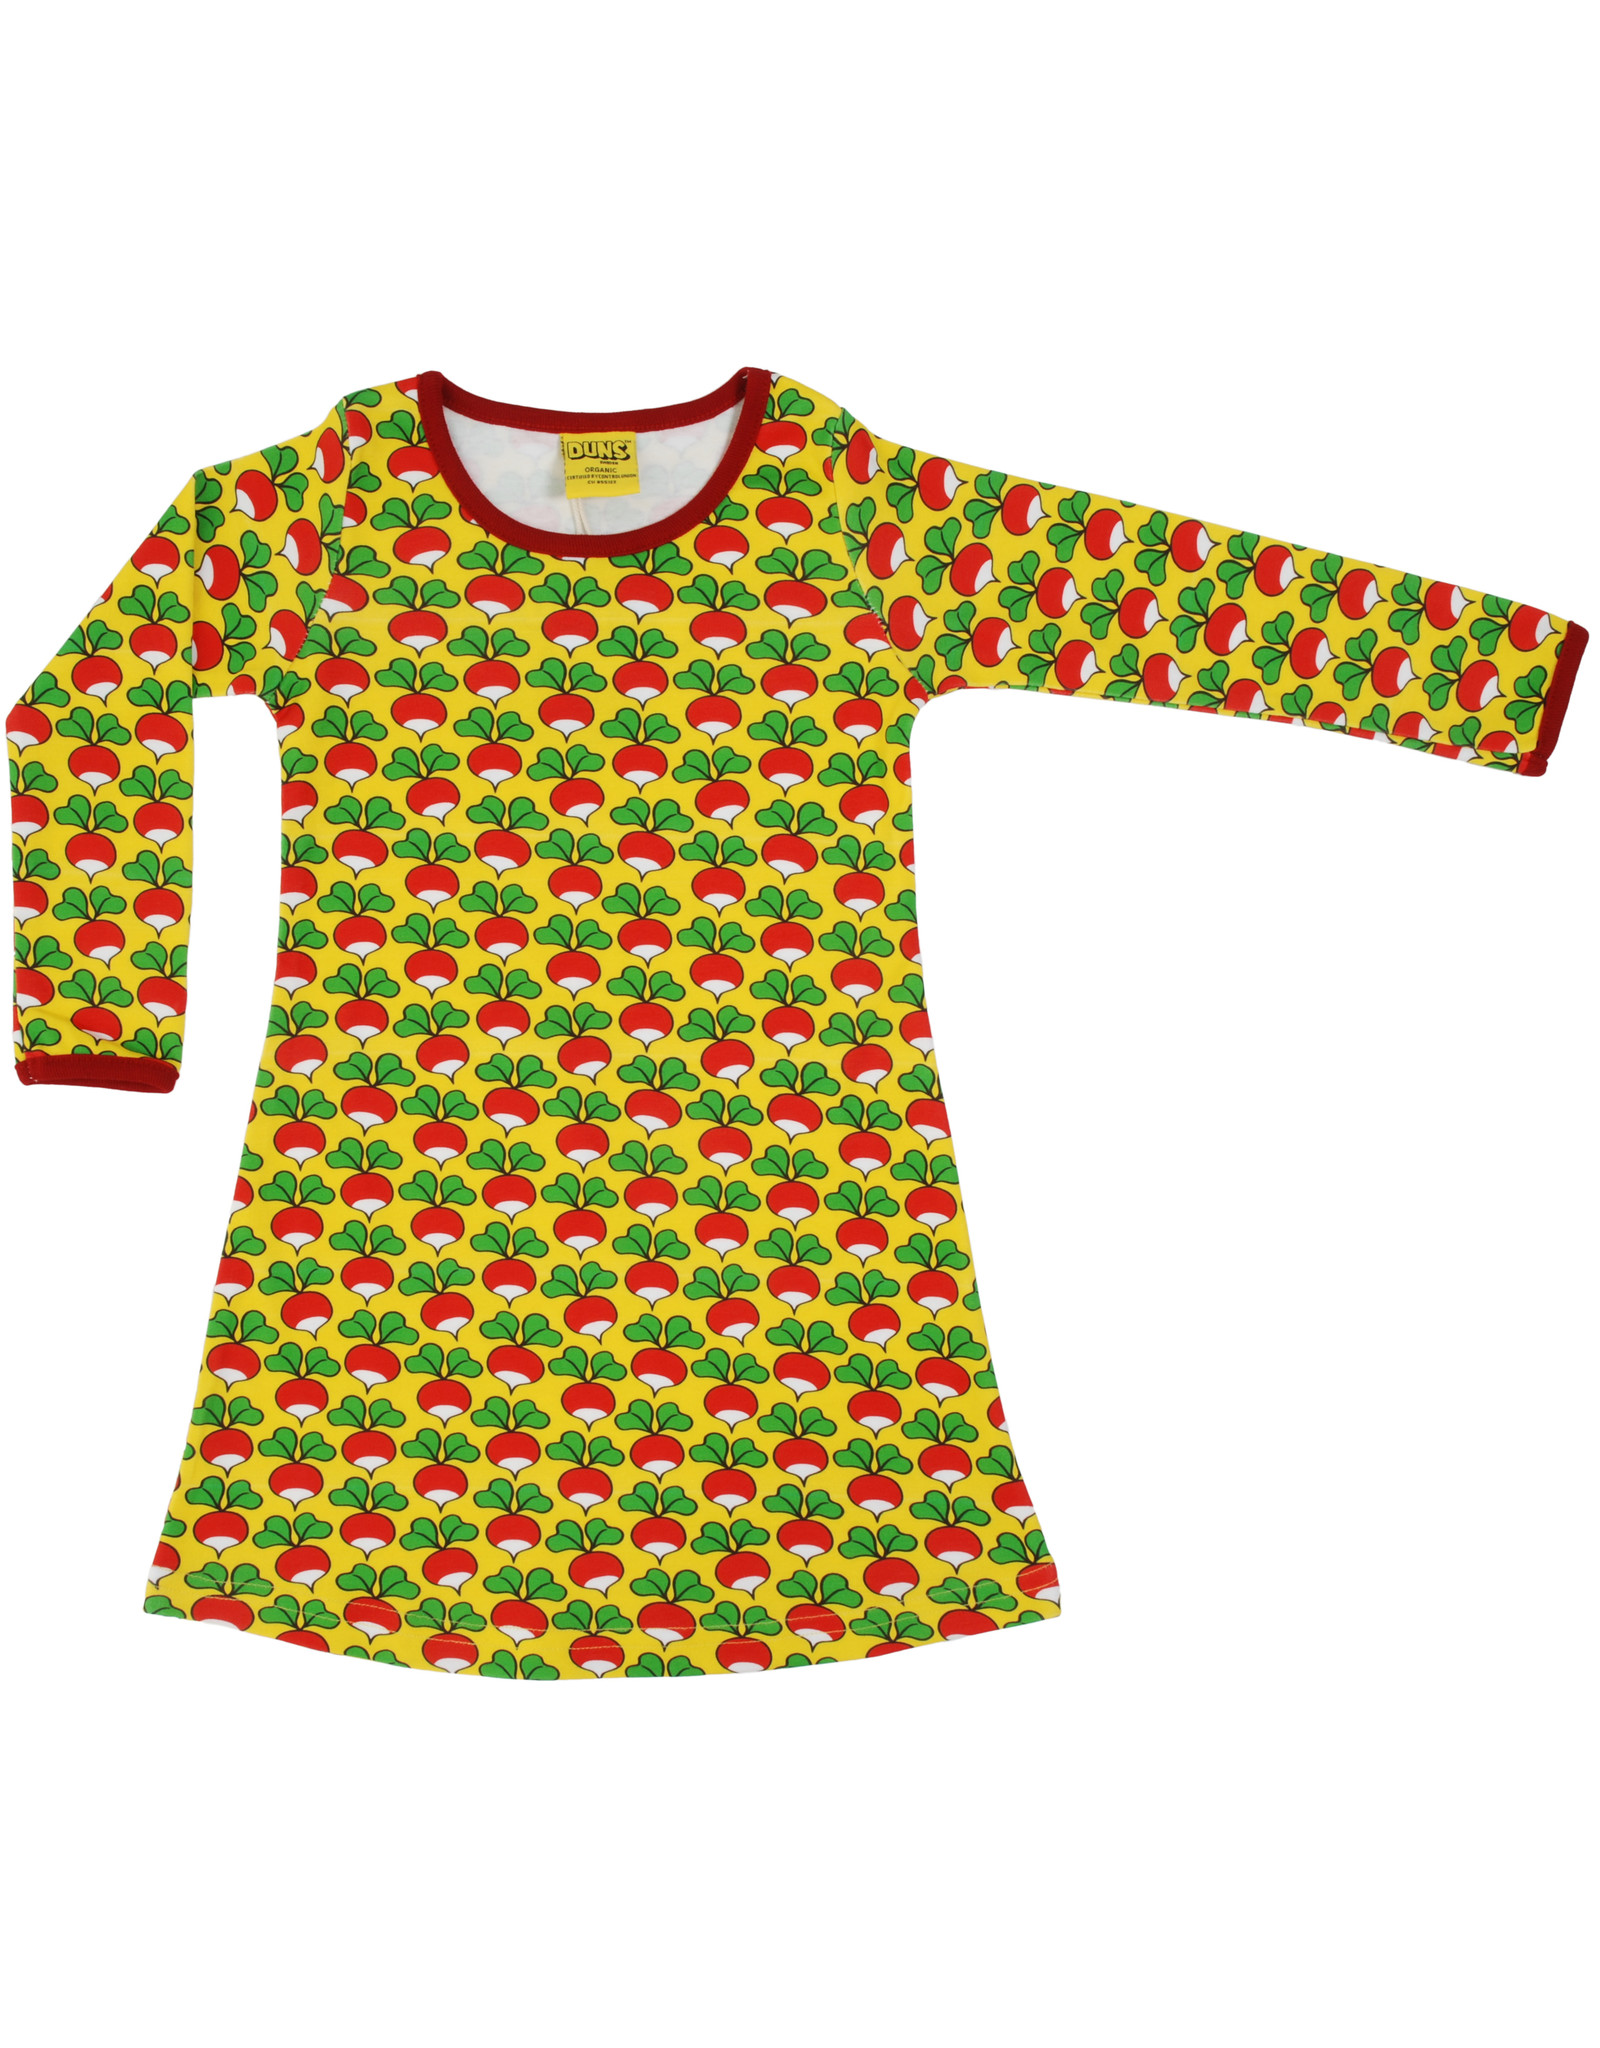 Duns Children's dress - yellow radishes